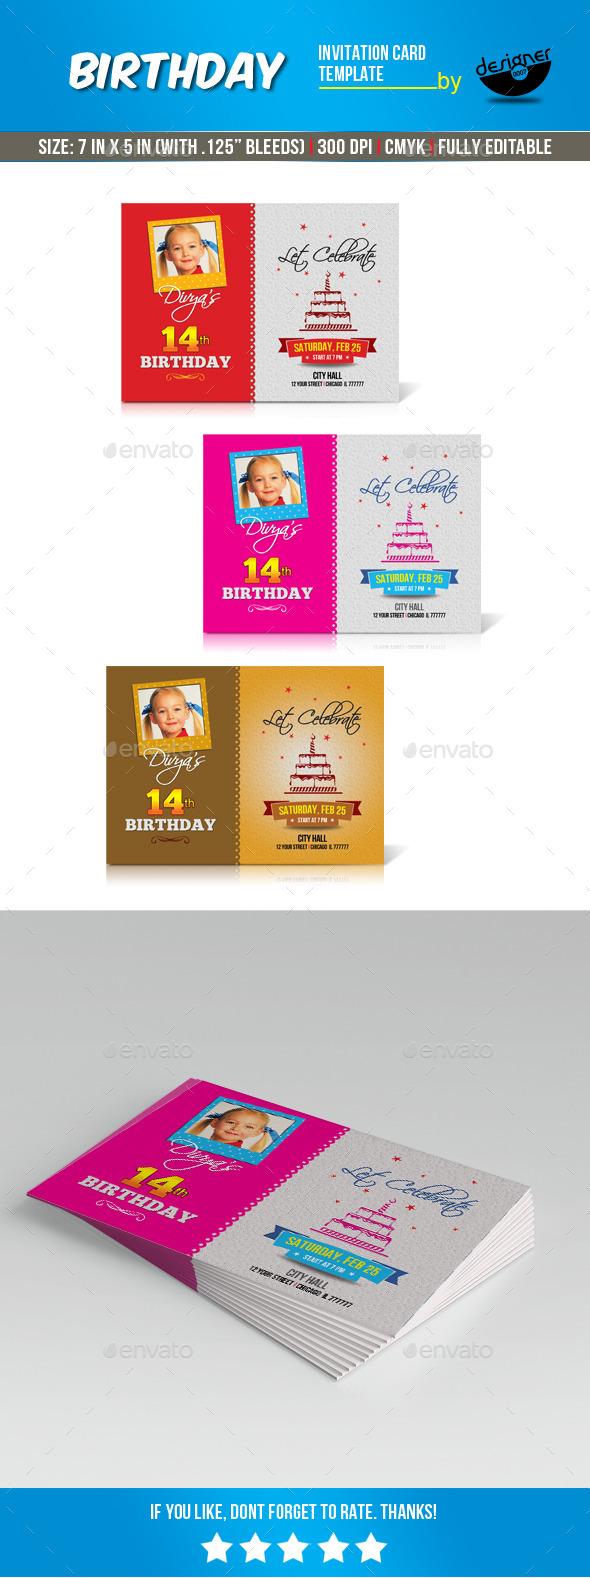 Birthday Invitation Card Template - Print Templates